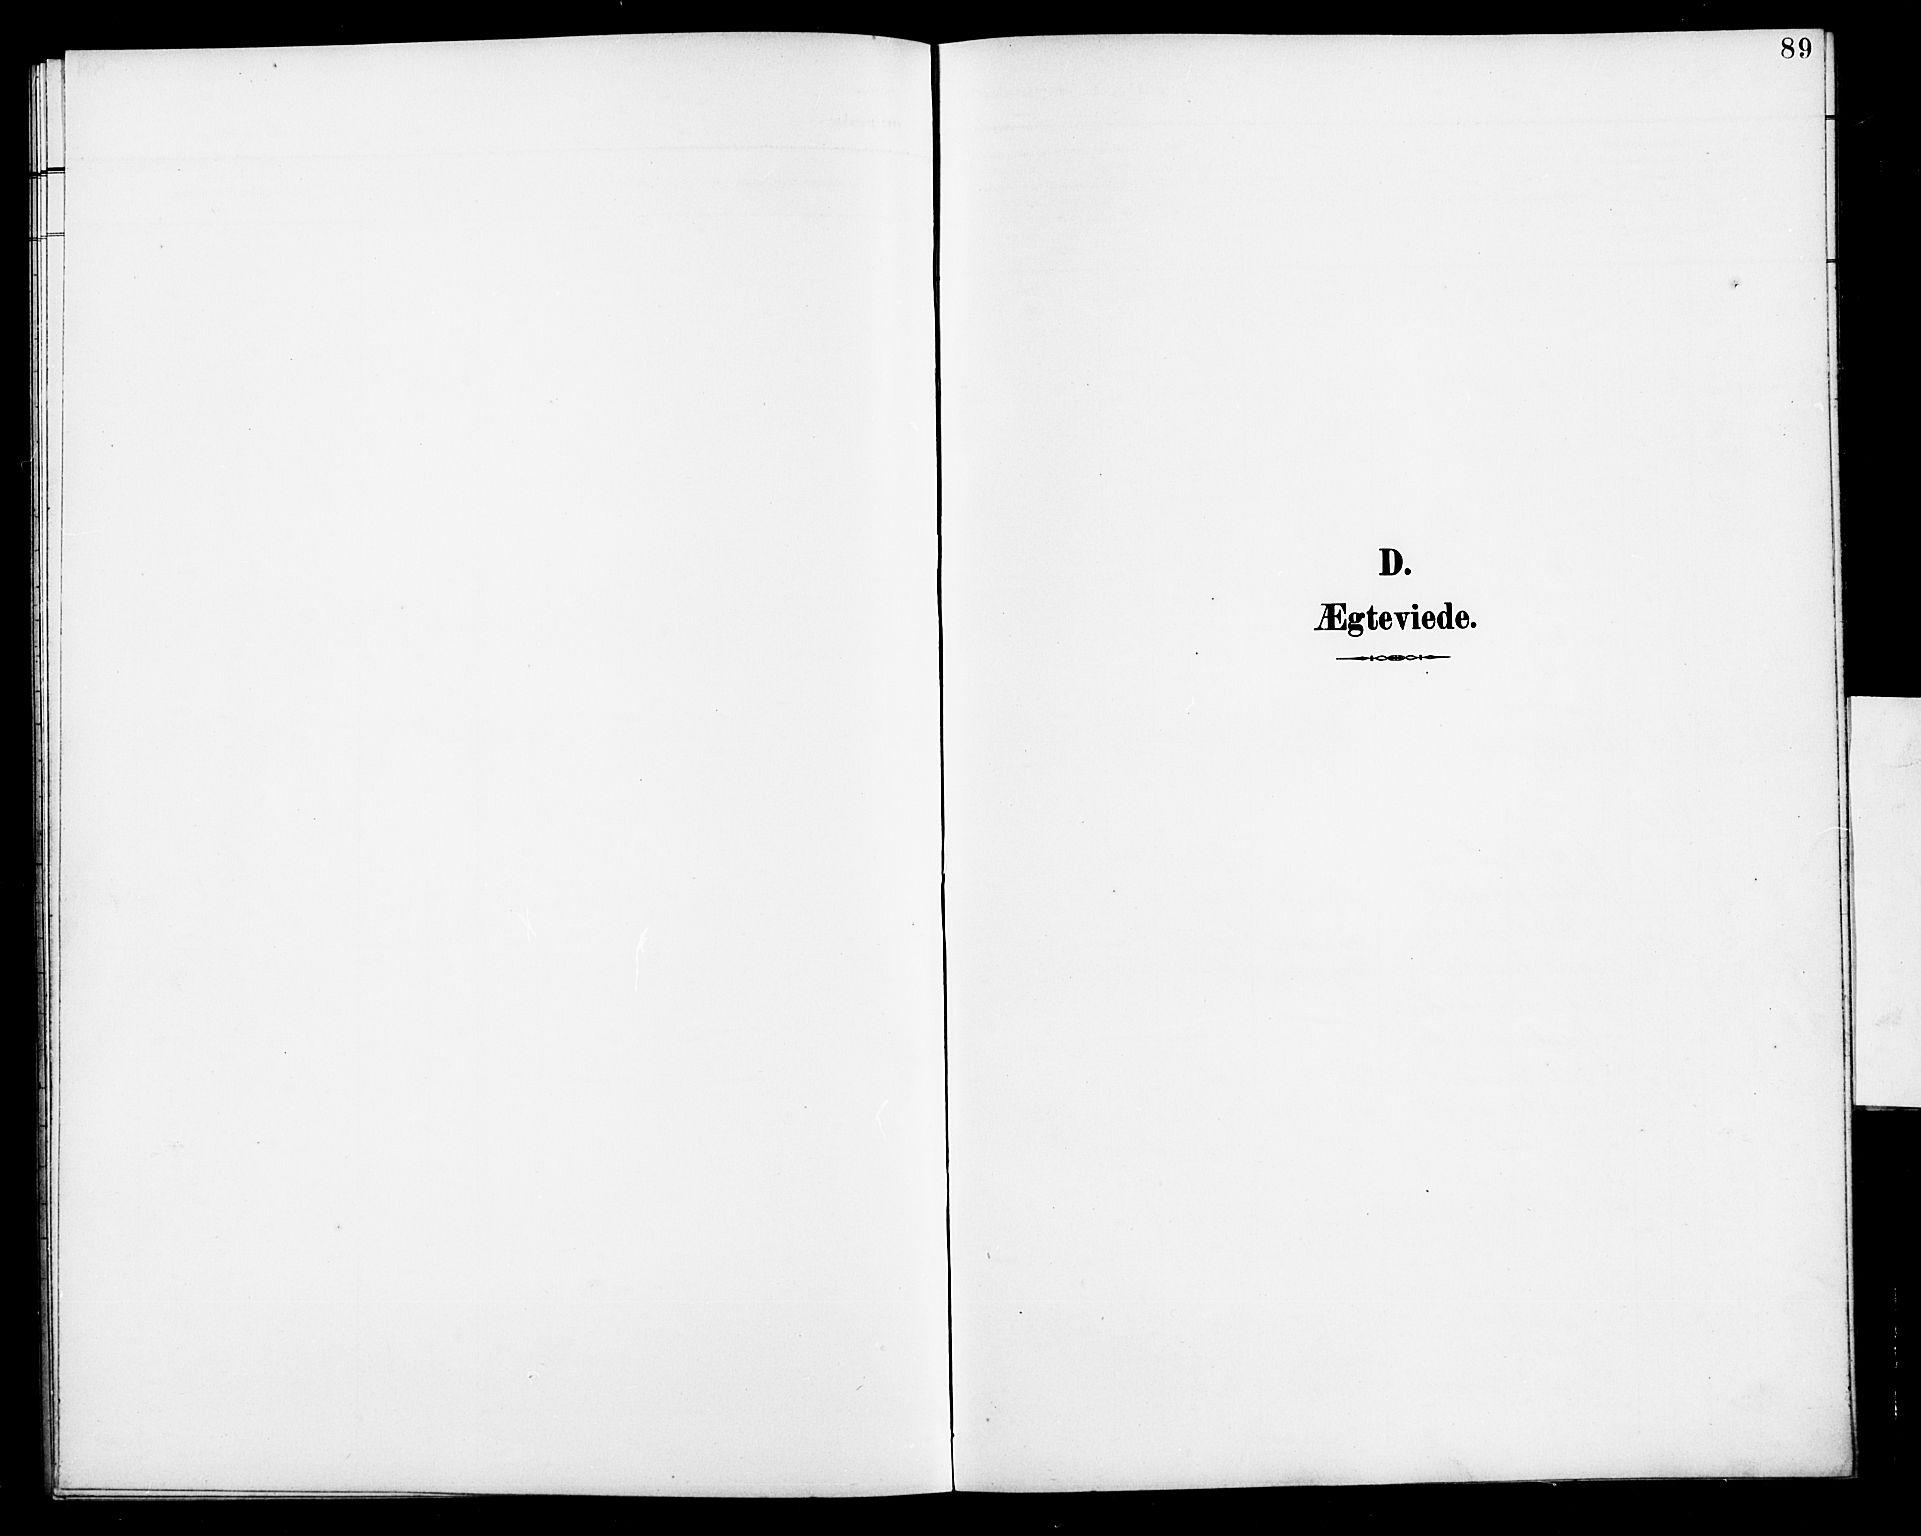 SAK, Herefoss sokneprestkontor, F/Fb/Fbb/L0003: Parish register (copy) no. B 3, 1892-1917, p. 89